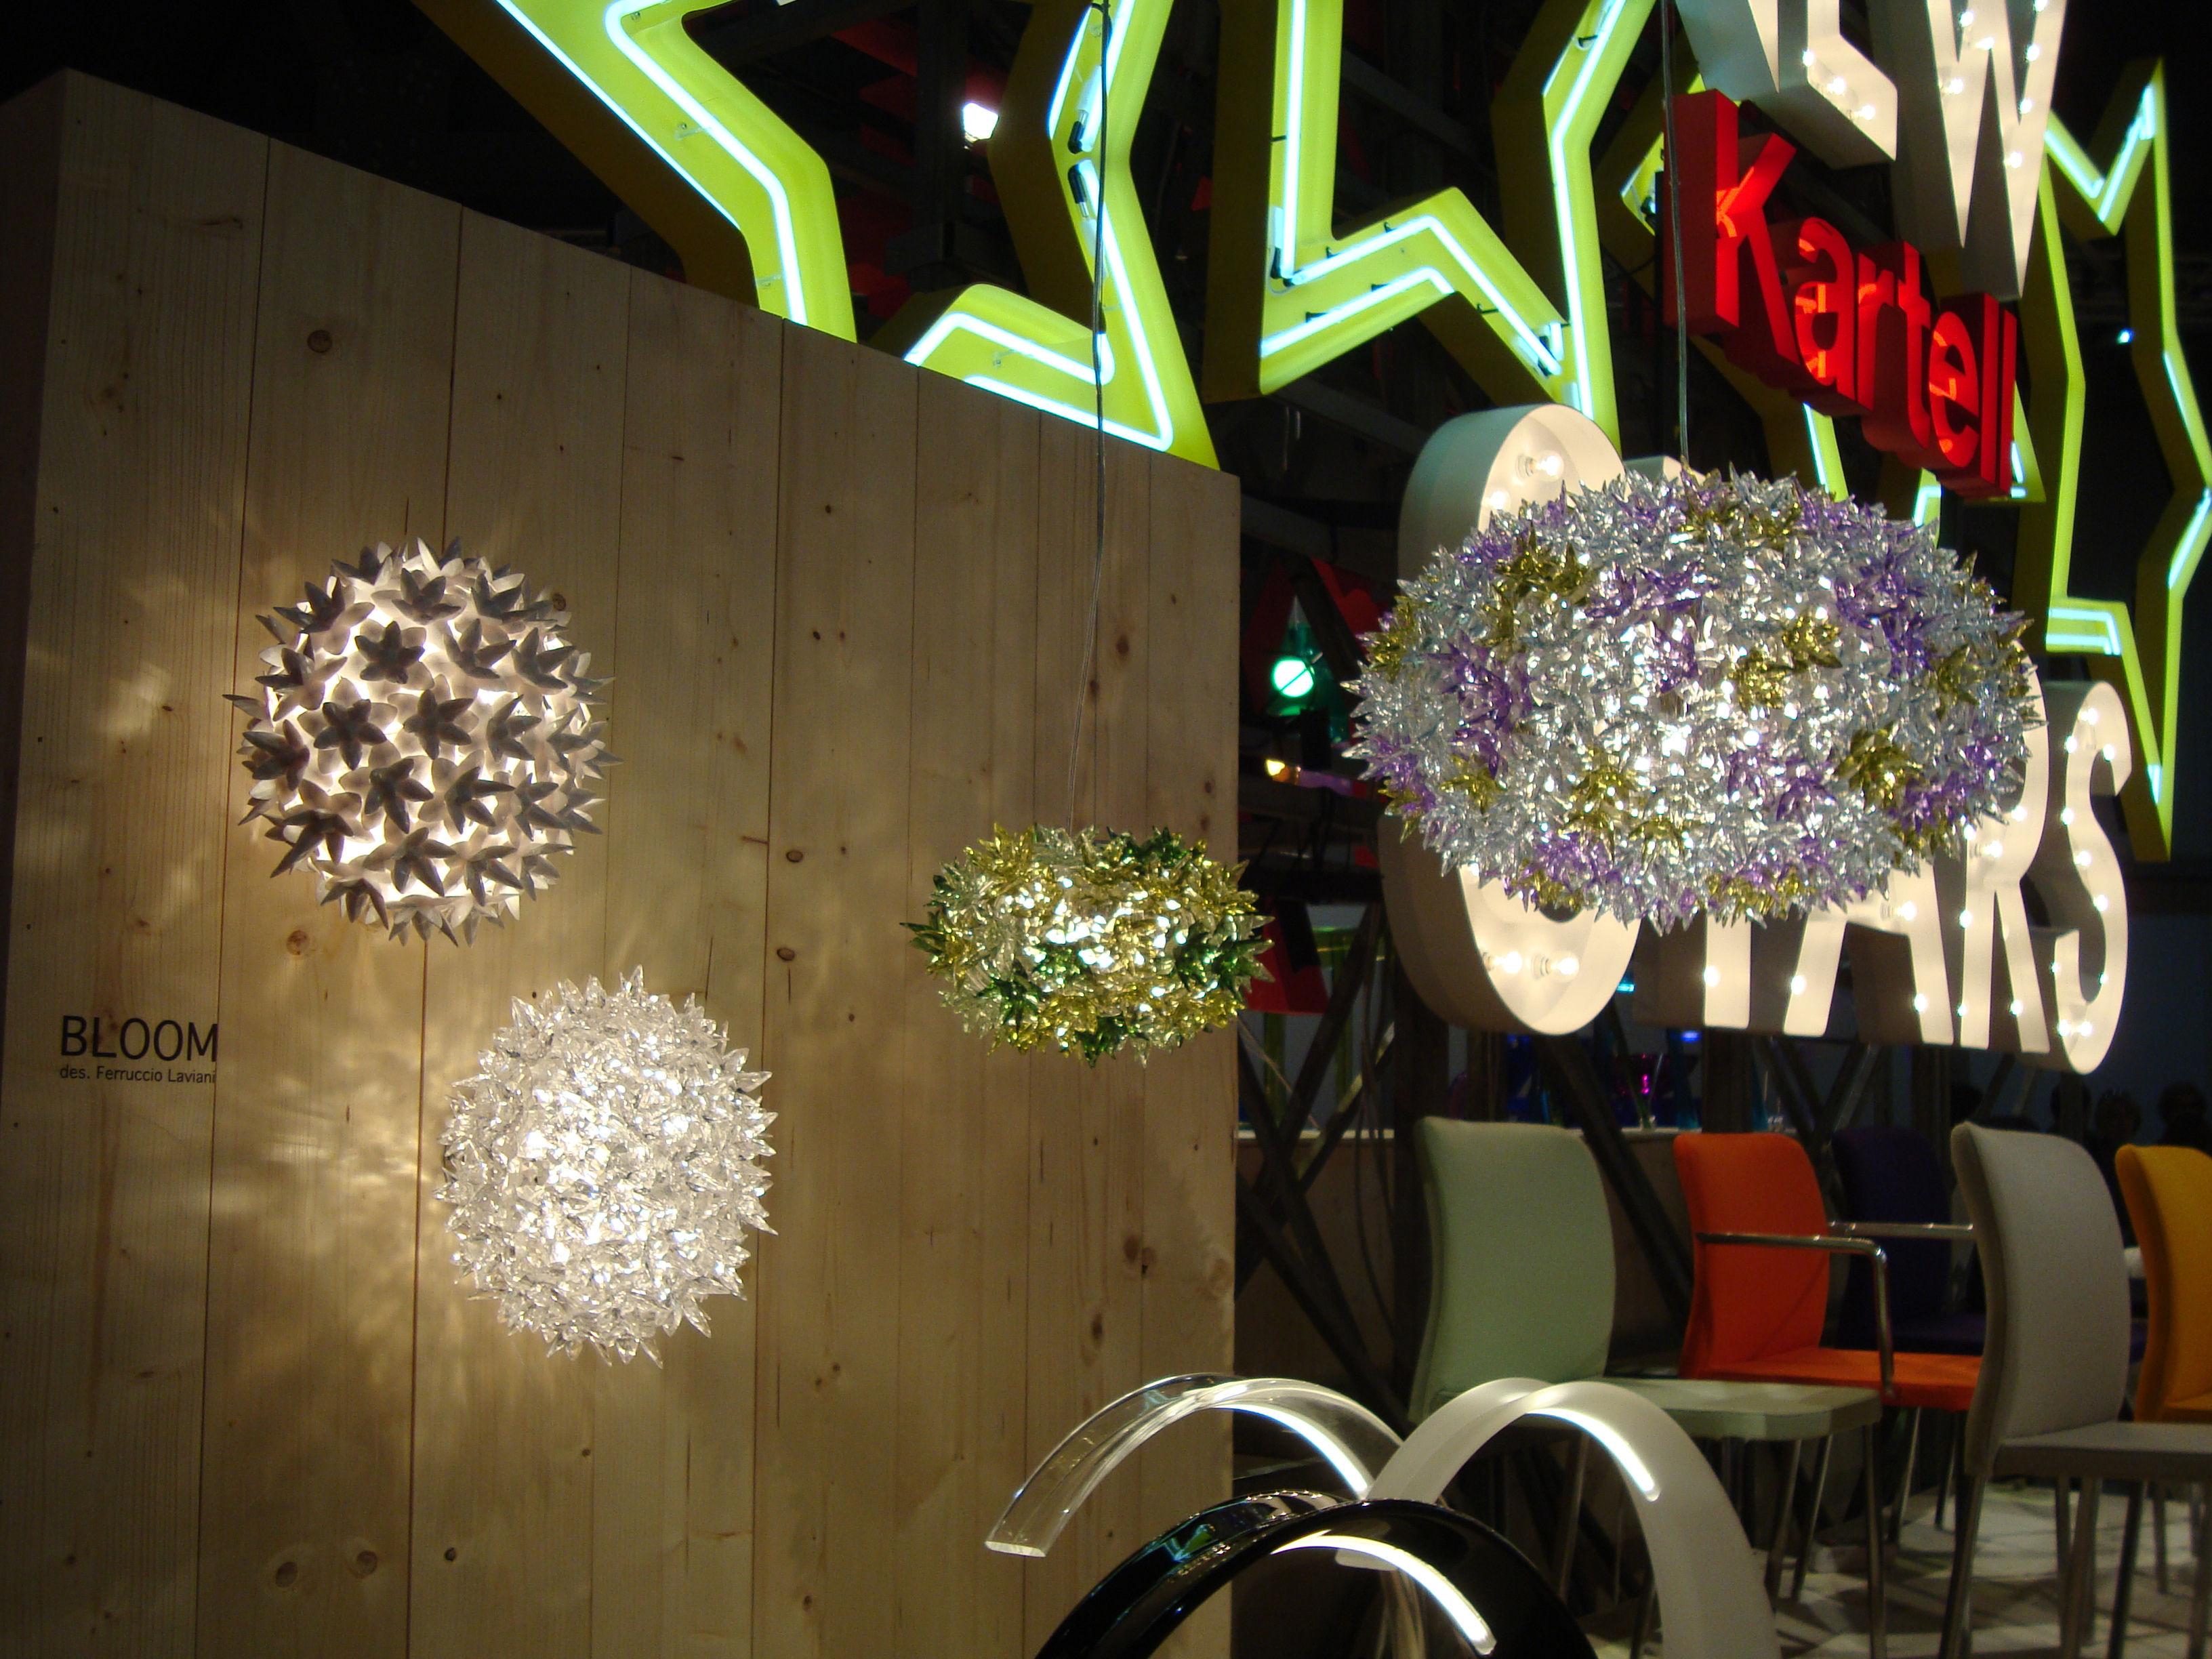 Plafoniere Kartell : Scopri plafoniera bloom bianco di kartell made in design italia